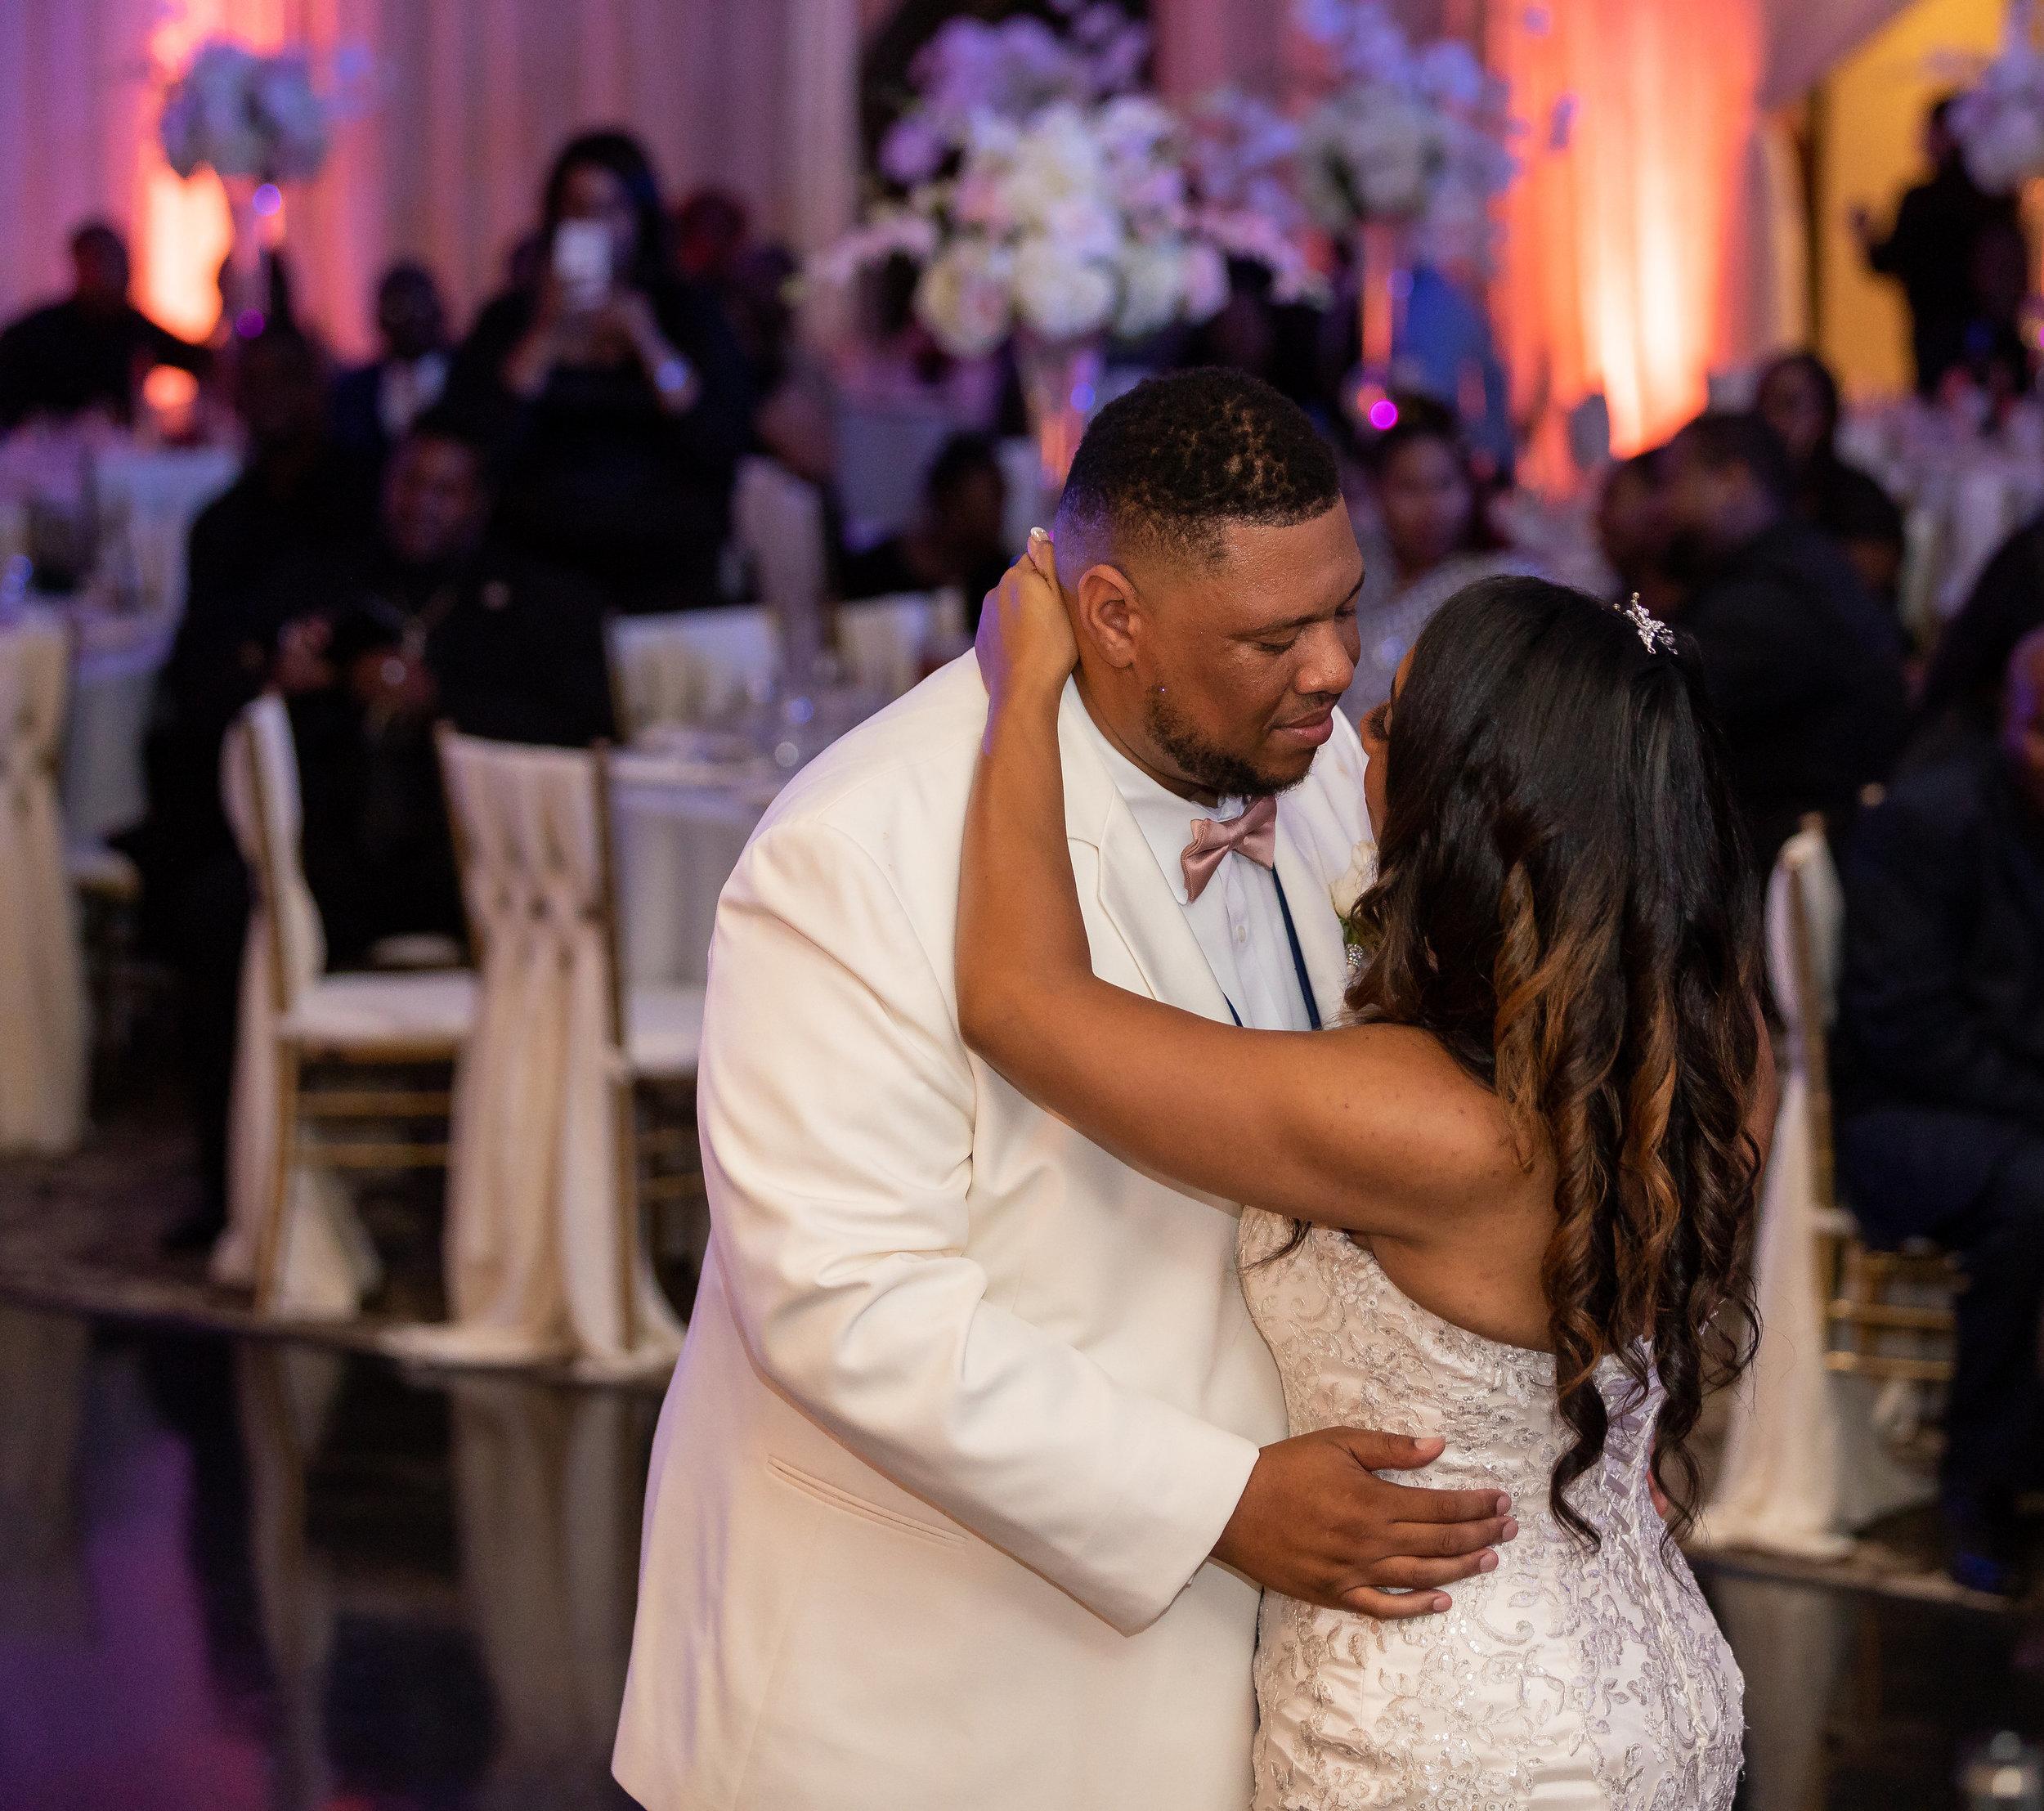 ! 1st Wedding Dance as Husband and Wife.jpg